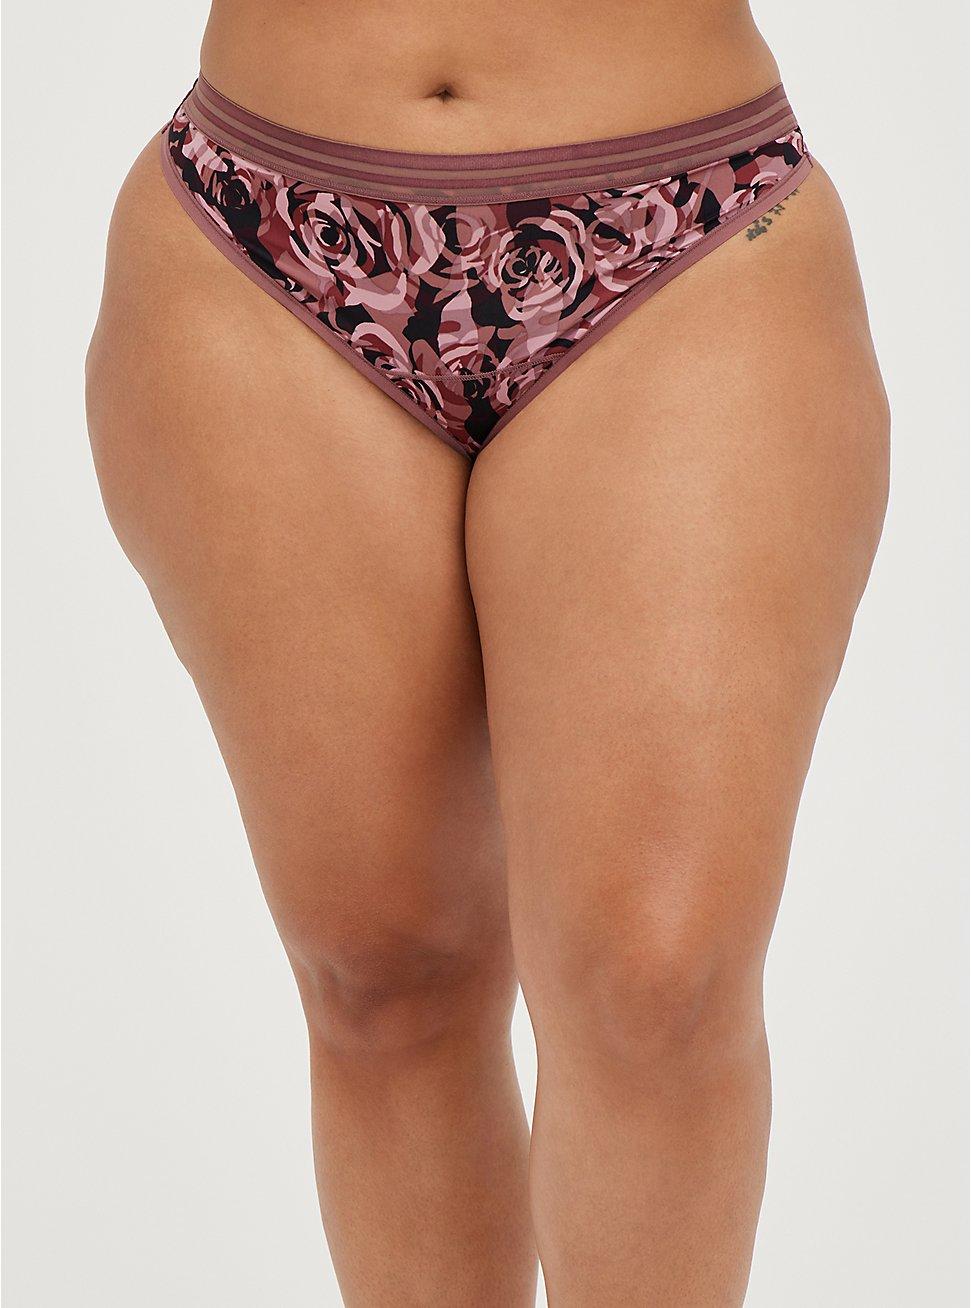 Second Skin Thong Panty - Microfiber Camo Rose, ROSEY CAMO, hi-res